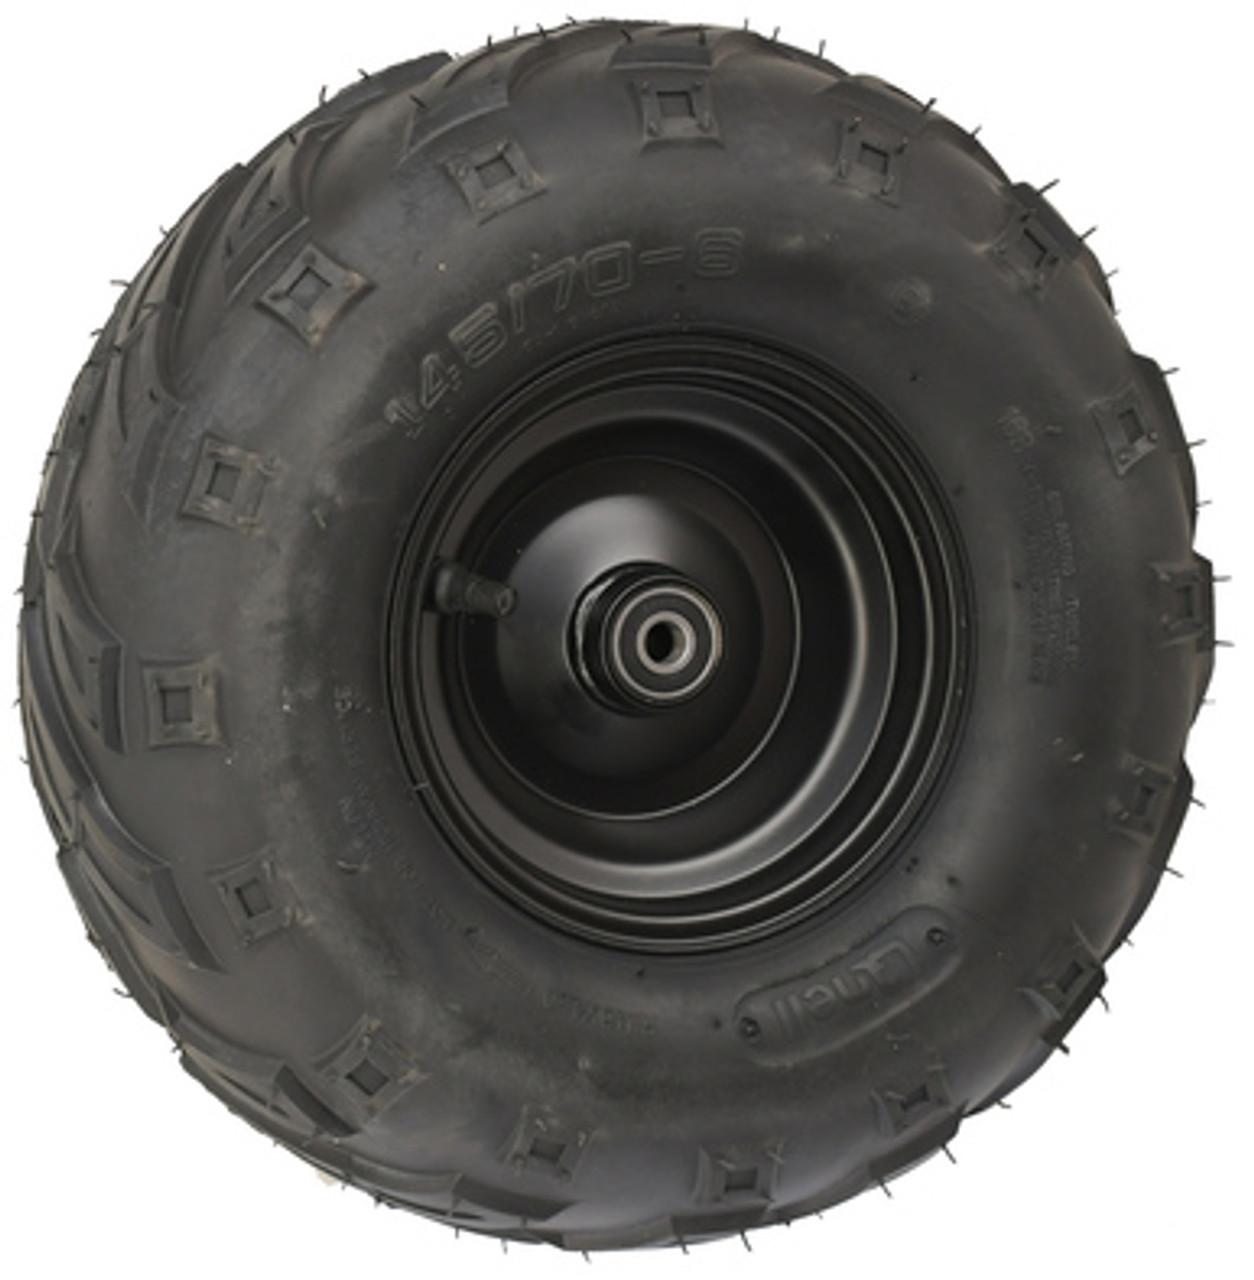 "Minibike 6"" Front Steel Wheel Assembly, 145x70-6 V Tread"